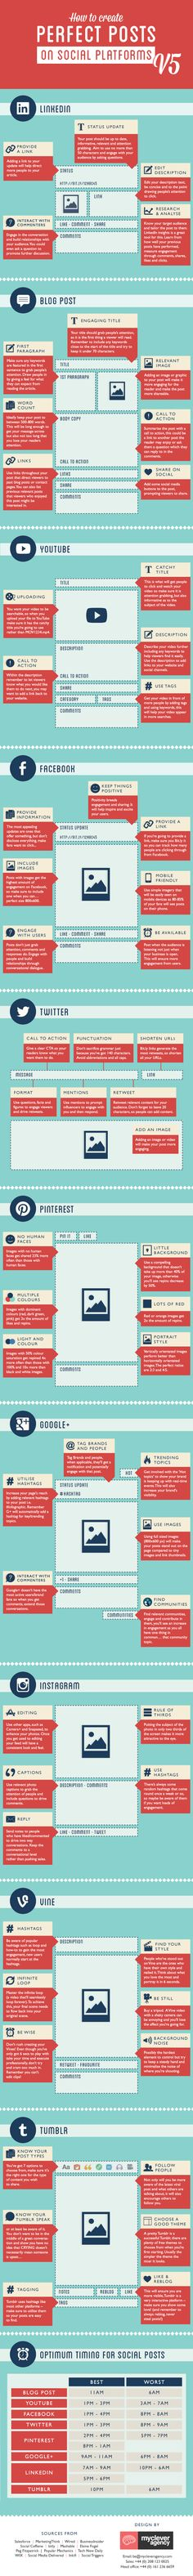 How to create perfect posts on social platforms V5 #infografia #infographic #socialmedia